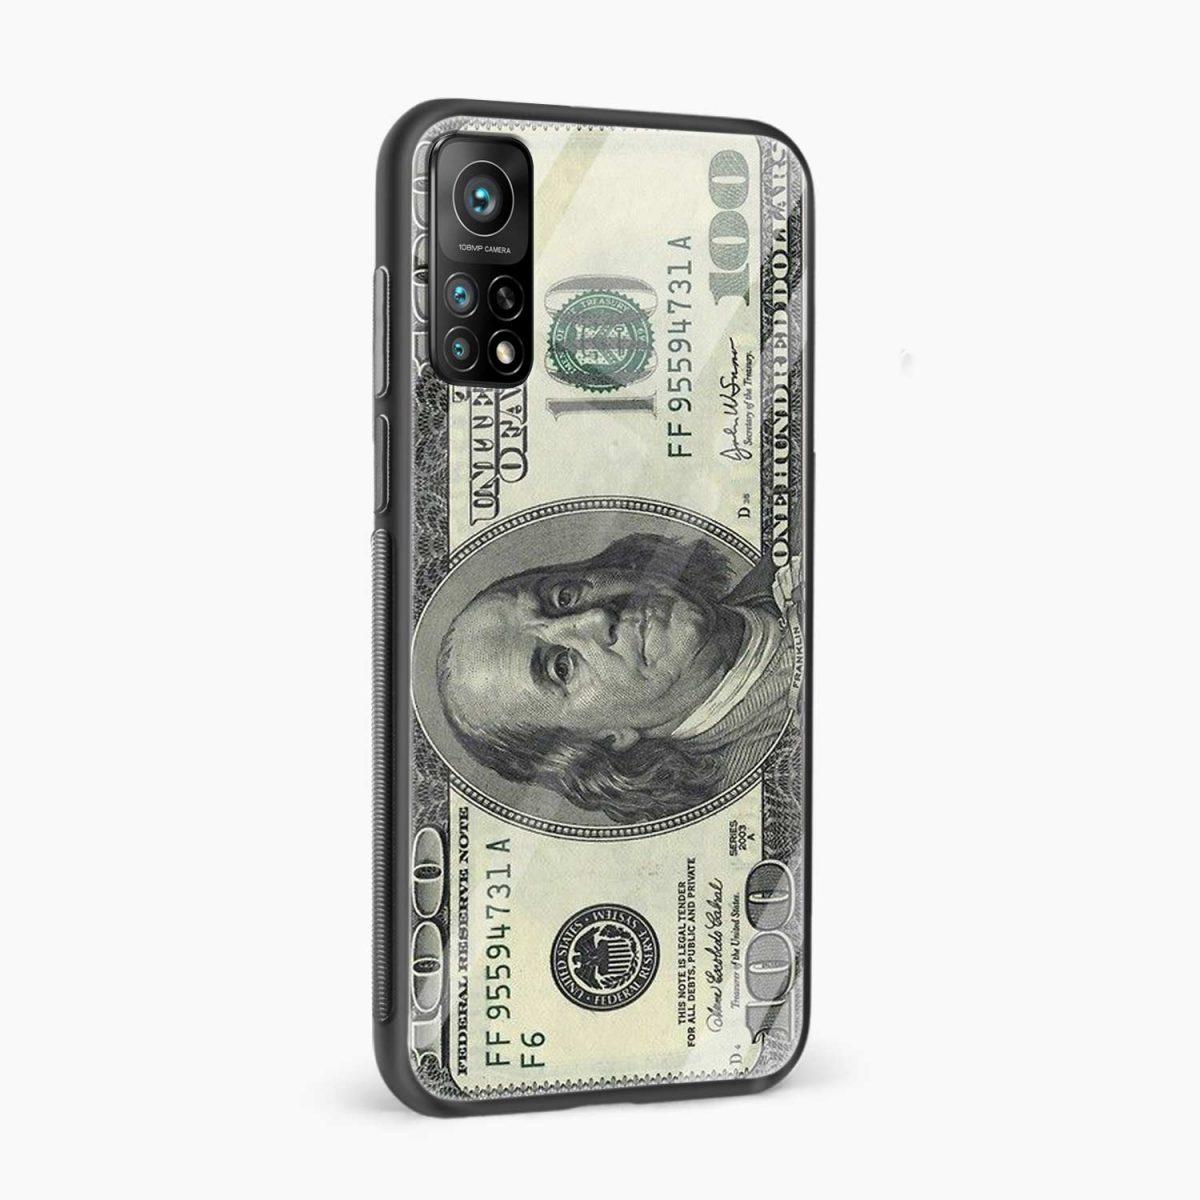 dollar xiaomi mi 10t pro back cover side view